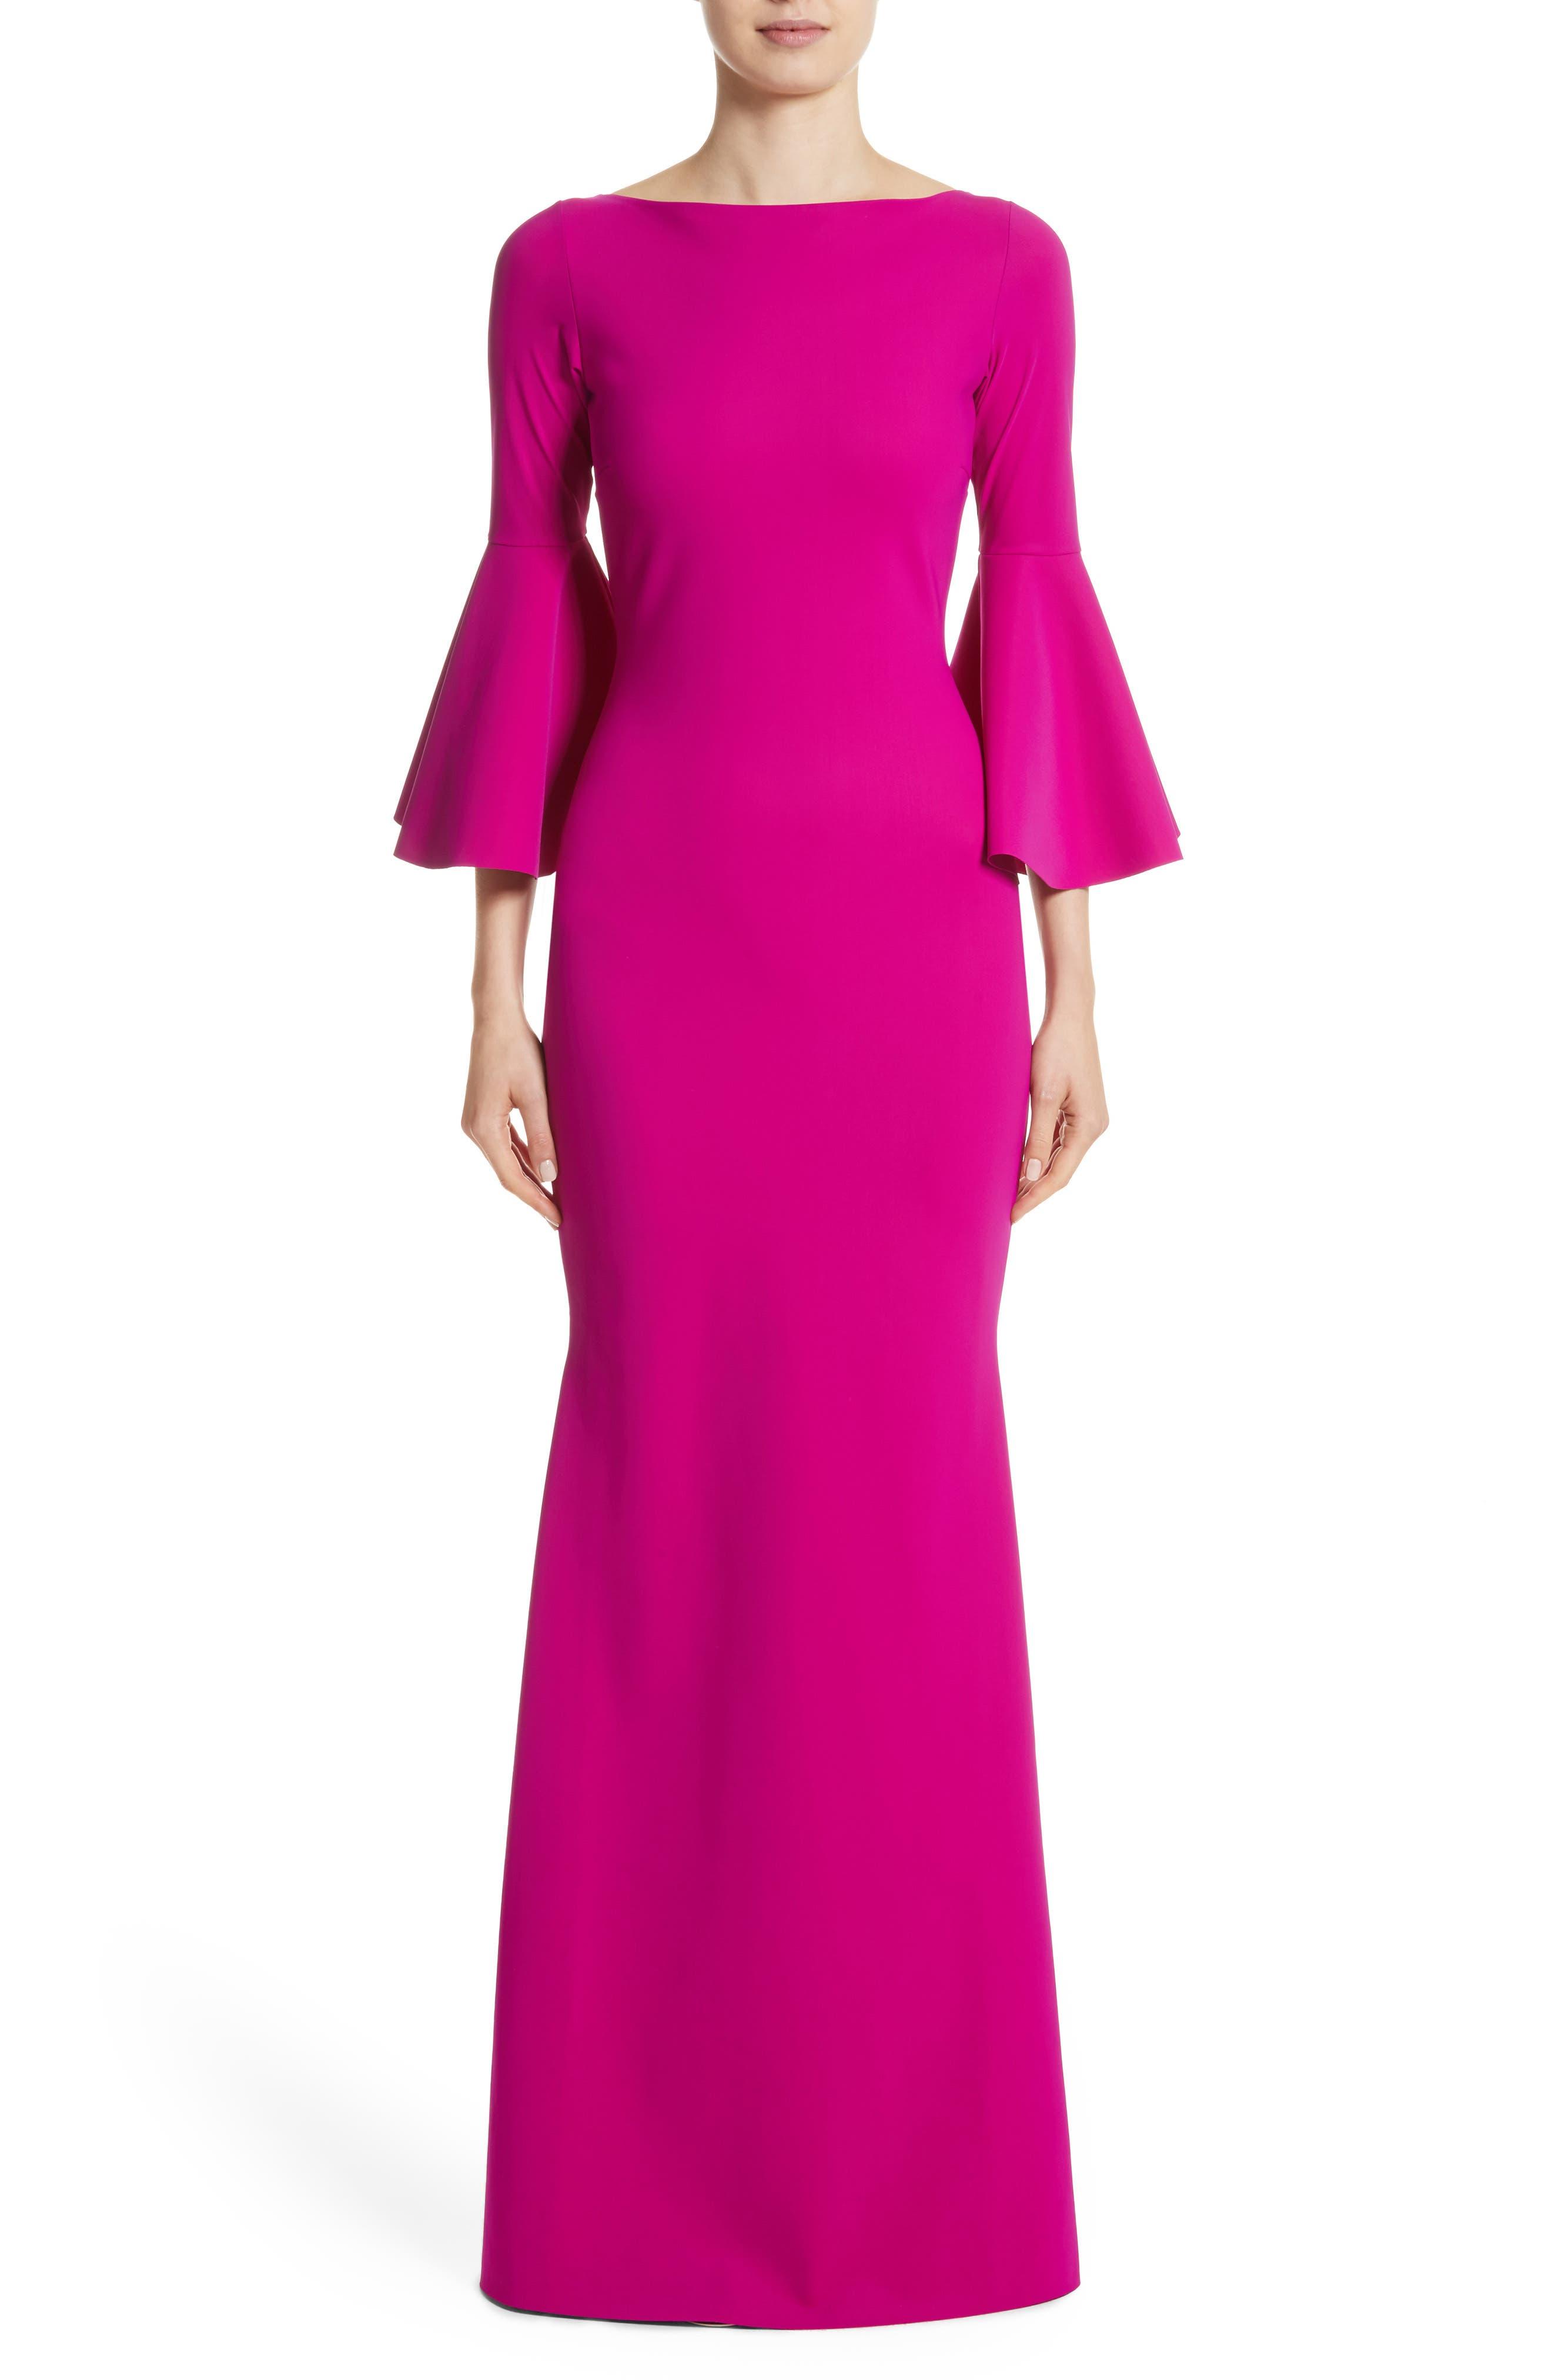 Main Image - Chiara Boni La Petite Robe Iva Bell Sleeve Gown